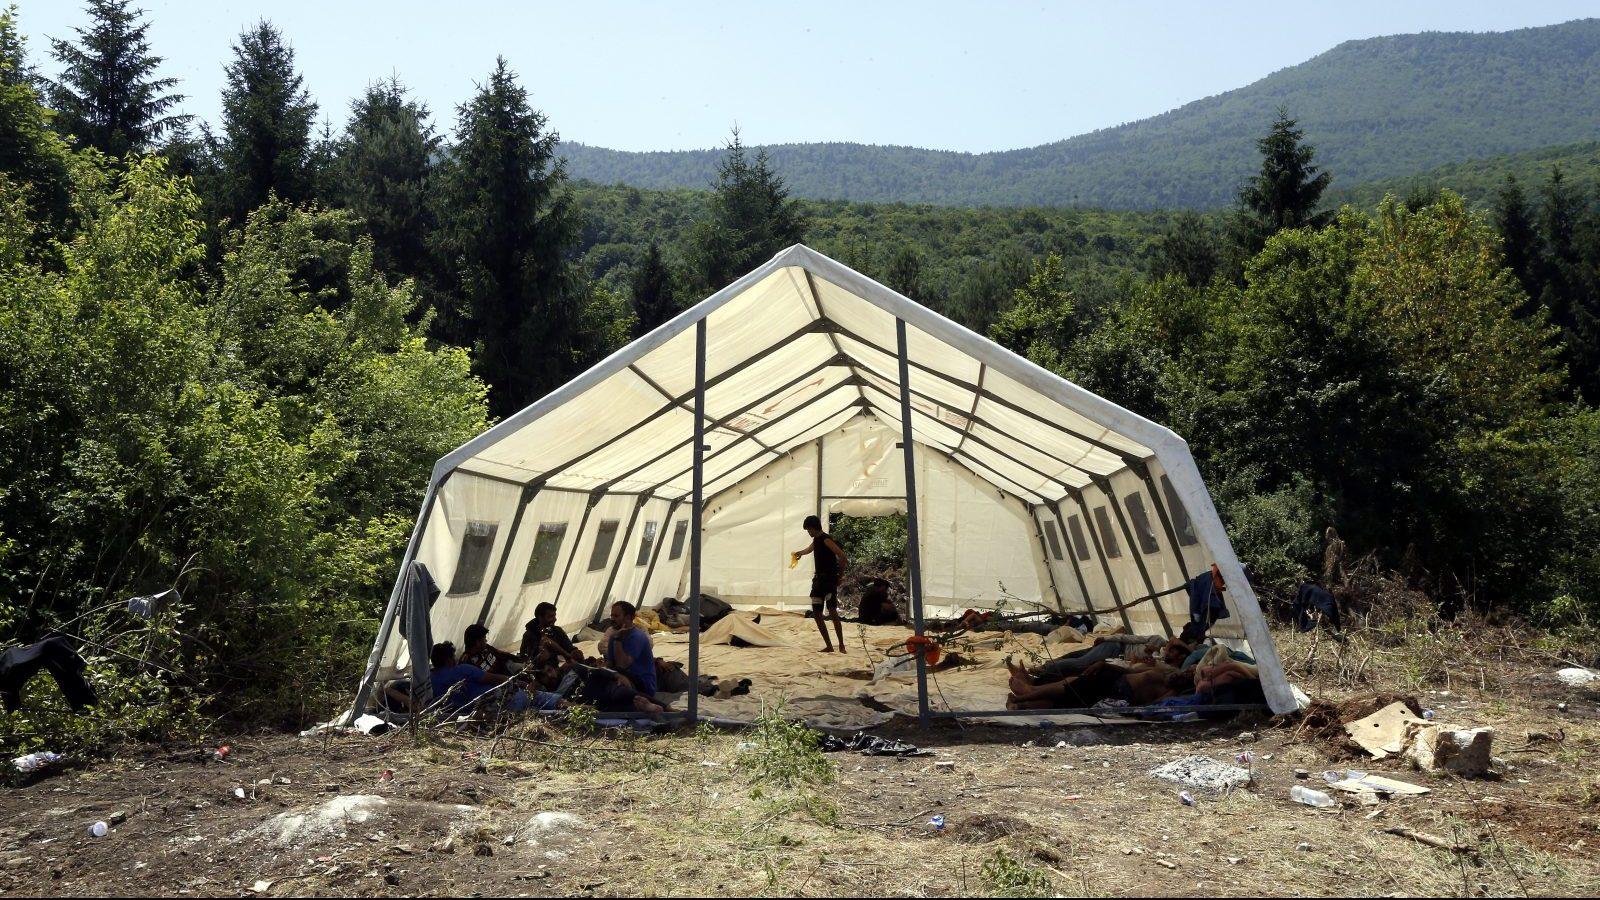 Bosnia Struggling to Prosecute Migrants when Identity in Doubt | Balkan Insight